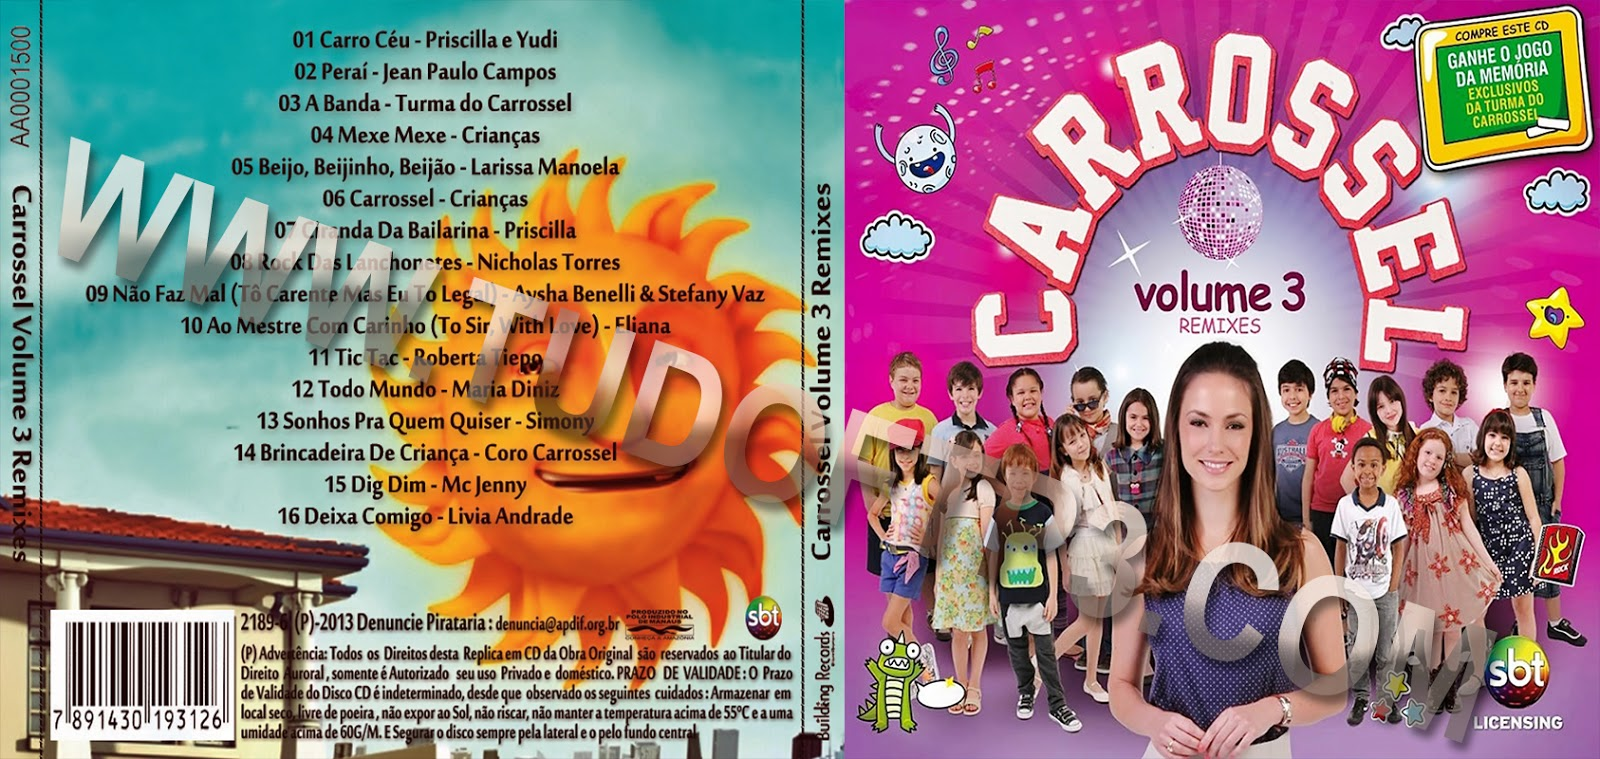 cd do carrossel volume 3 remix